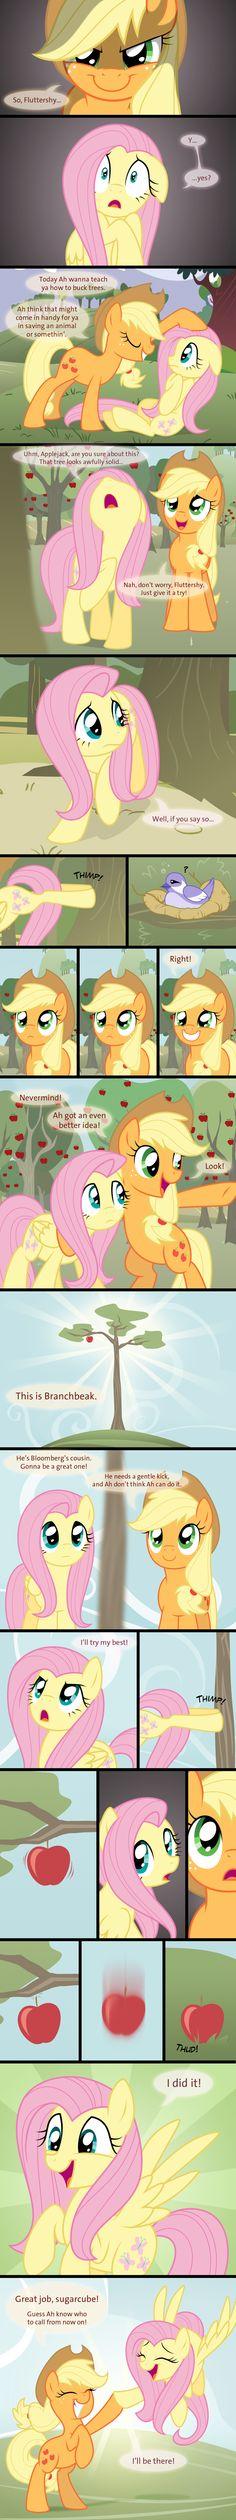 Aww, Applejack's so sweet :) <3